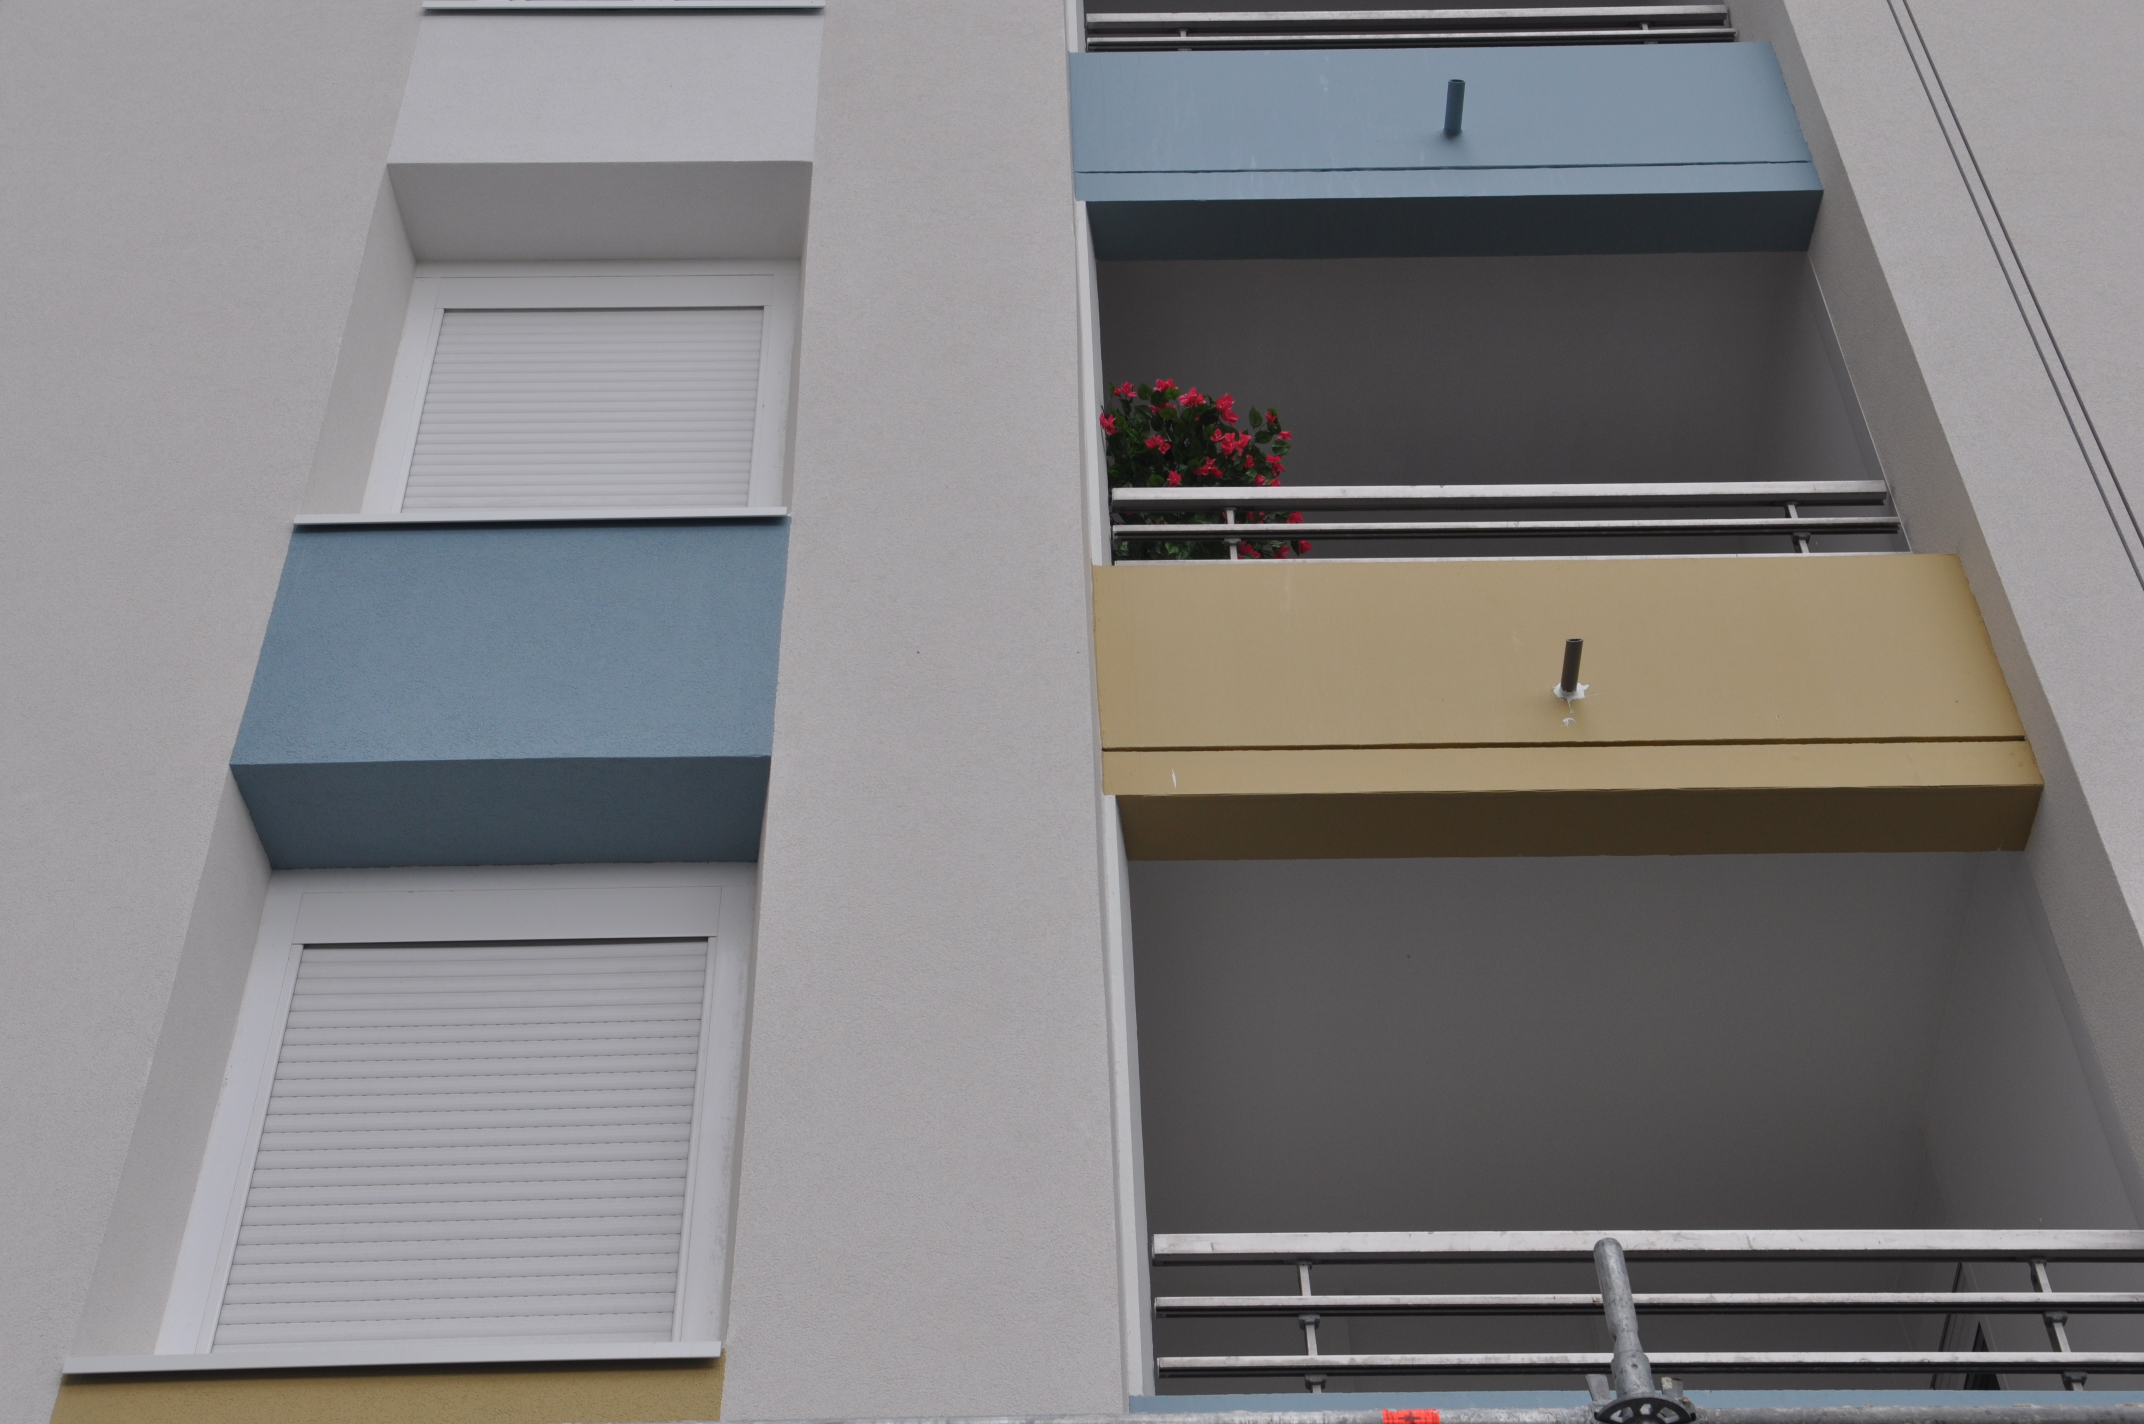 Façades ITE-Requalification architecturale